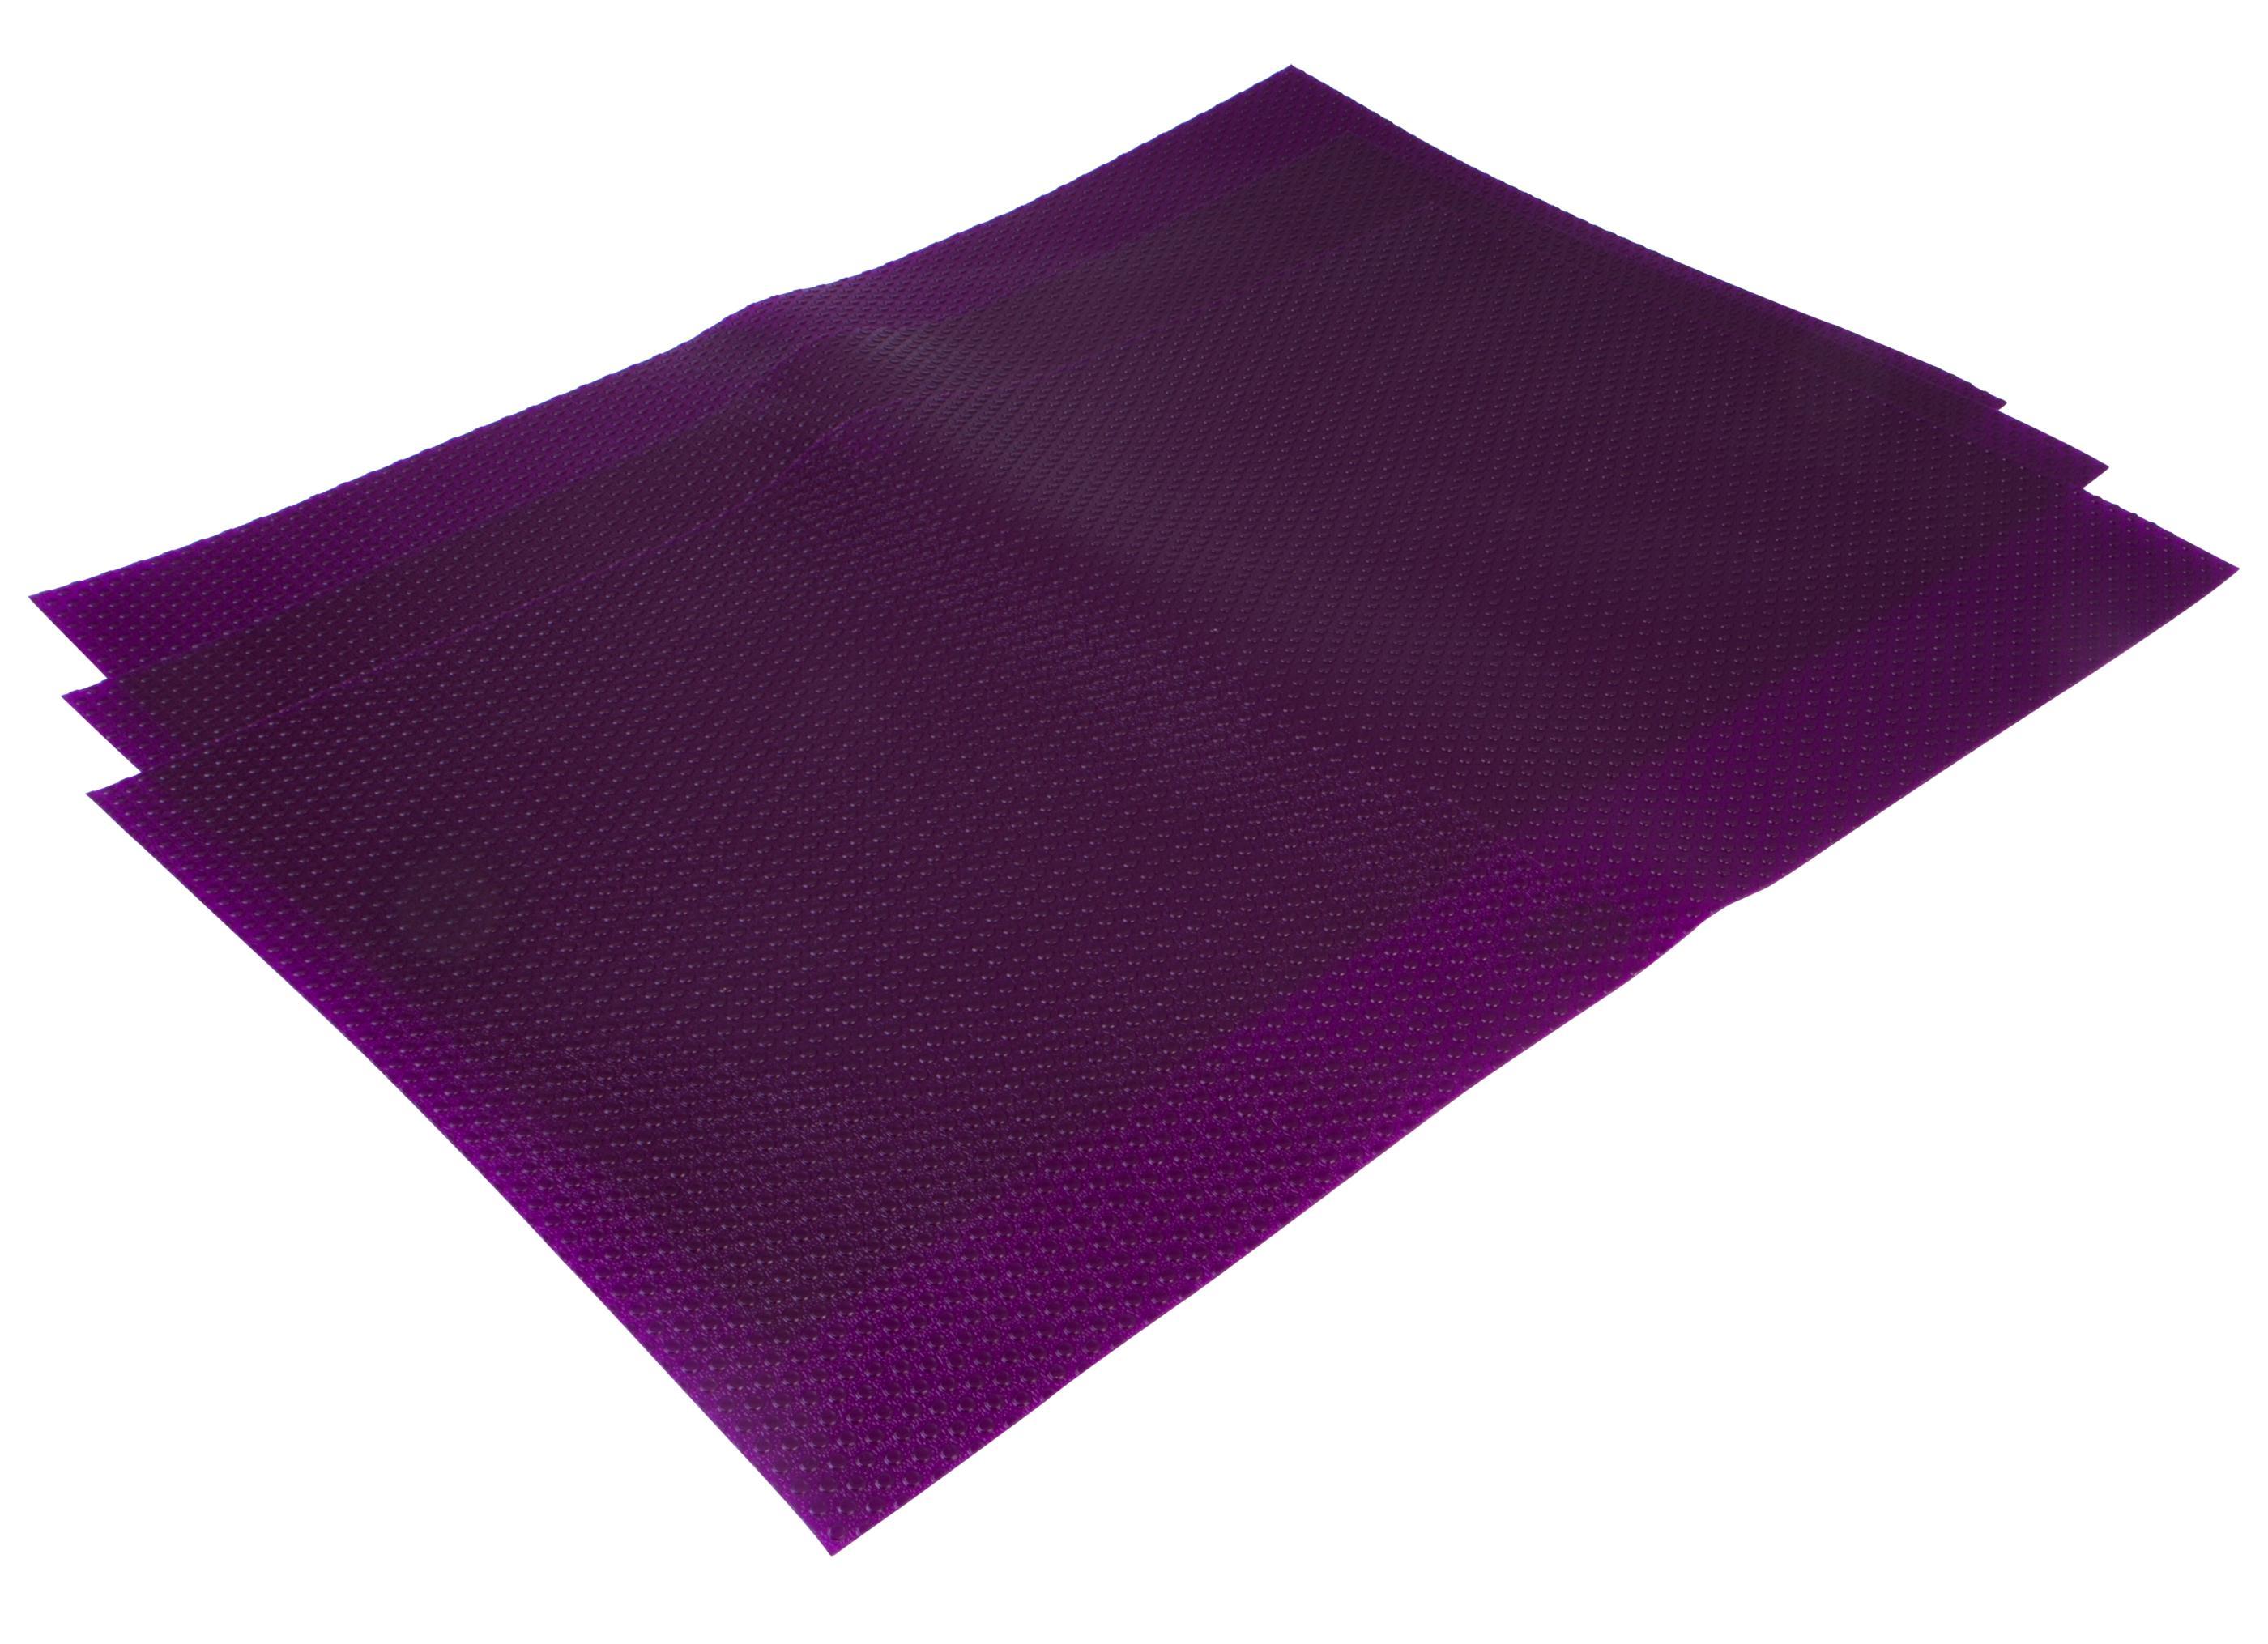 Retro Kühlschrank Violett : Kühlschrank lila kühlschrankmonster lily tailor